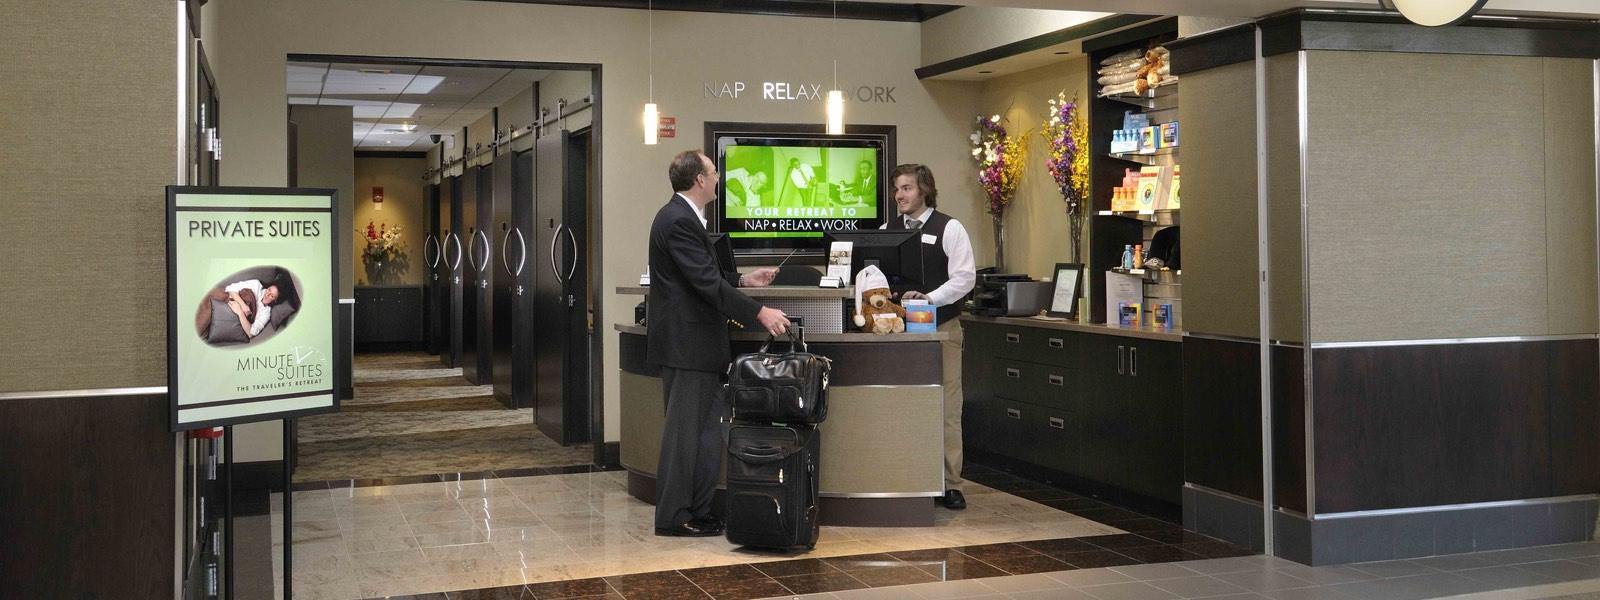 Minute Suites - Philadelphia International Airport PHL